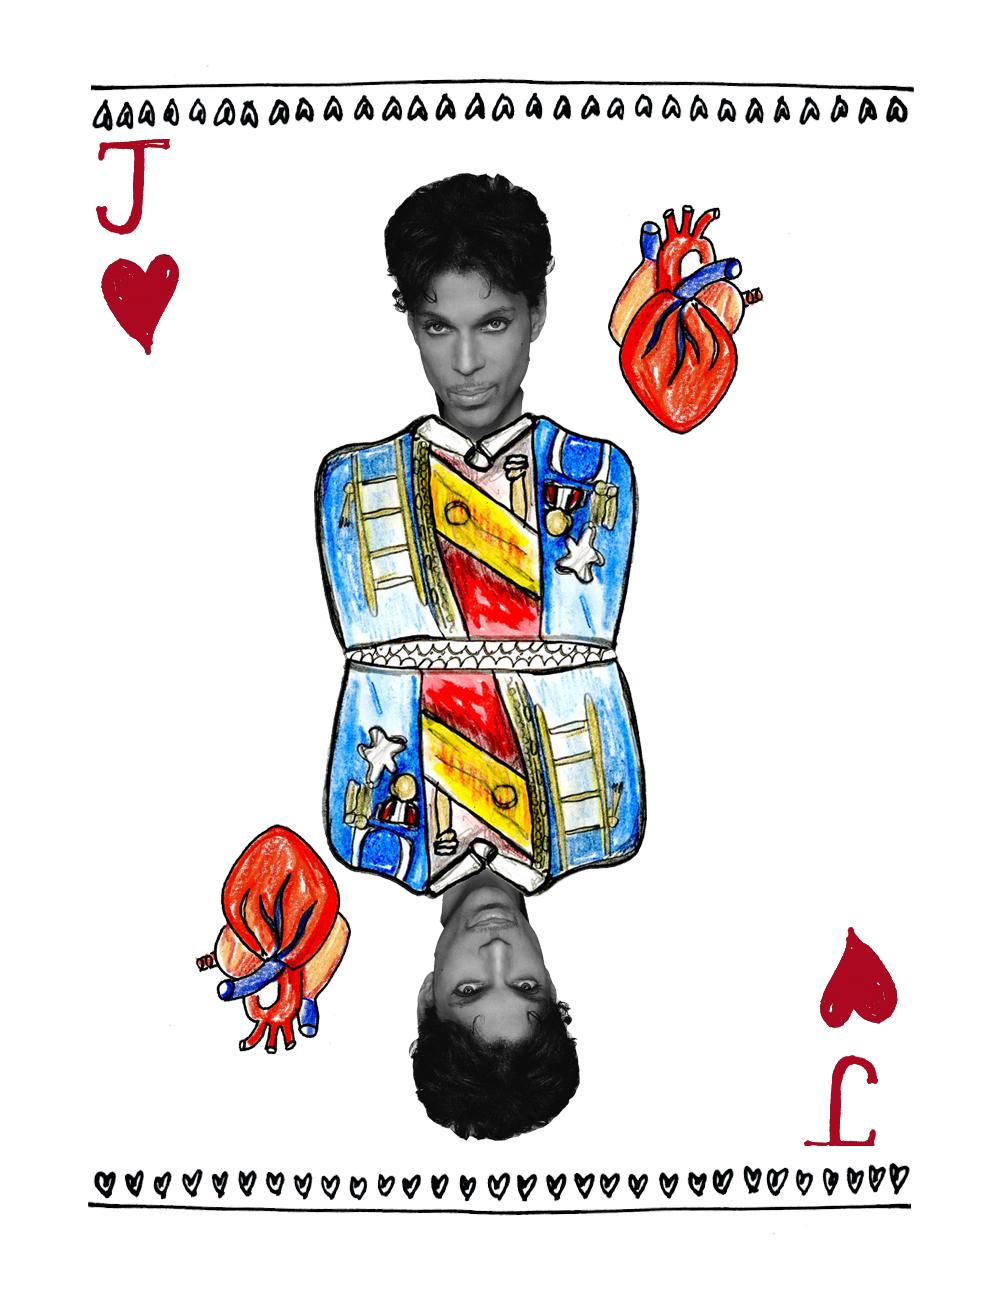 jackhearts.jpg